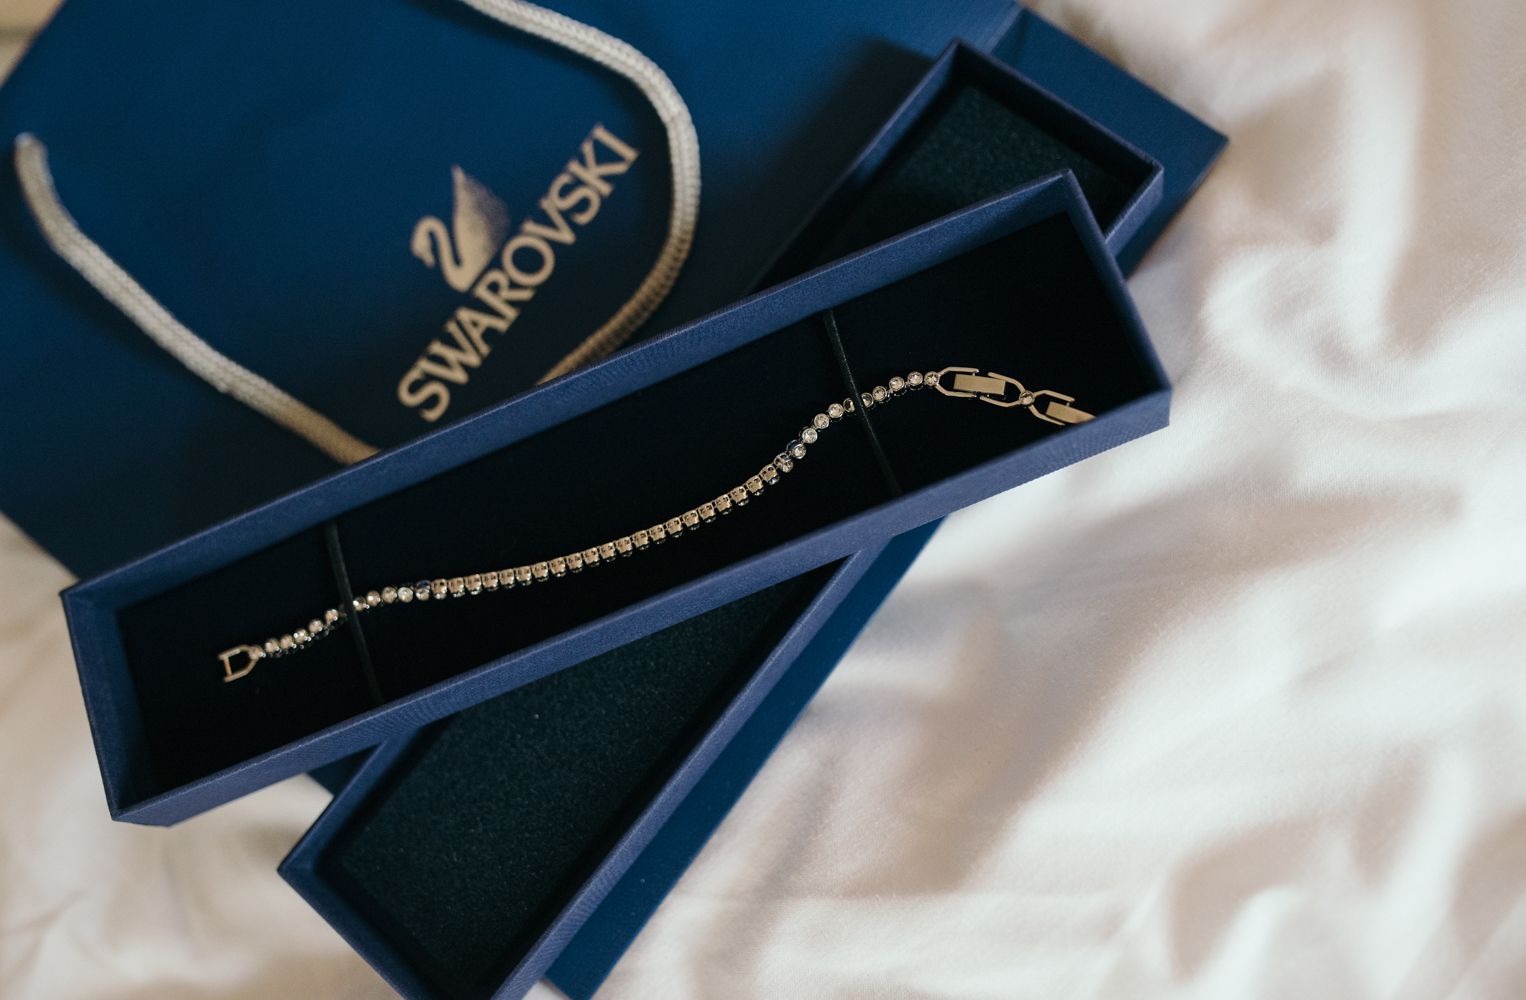 The brides wedding jewellery